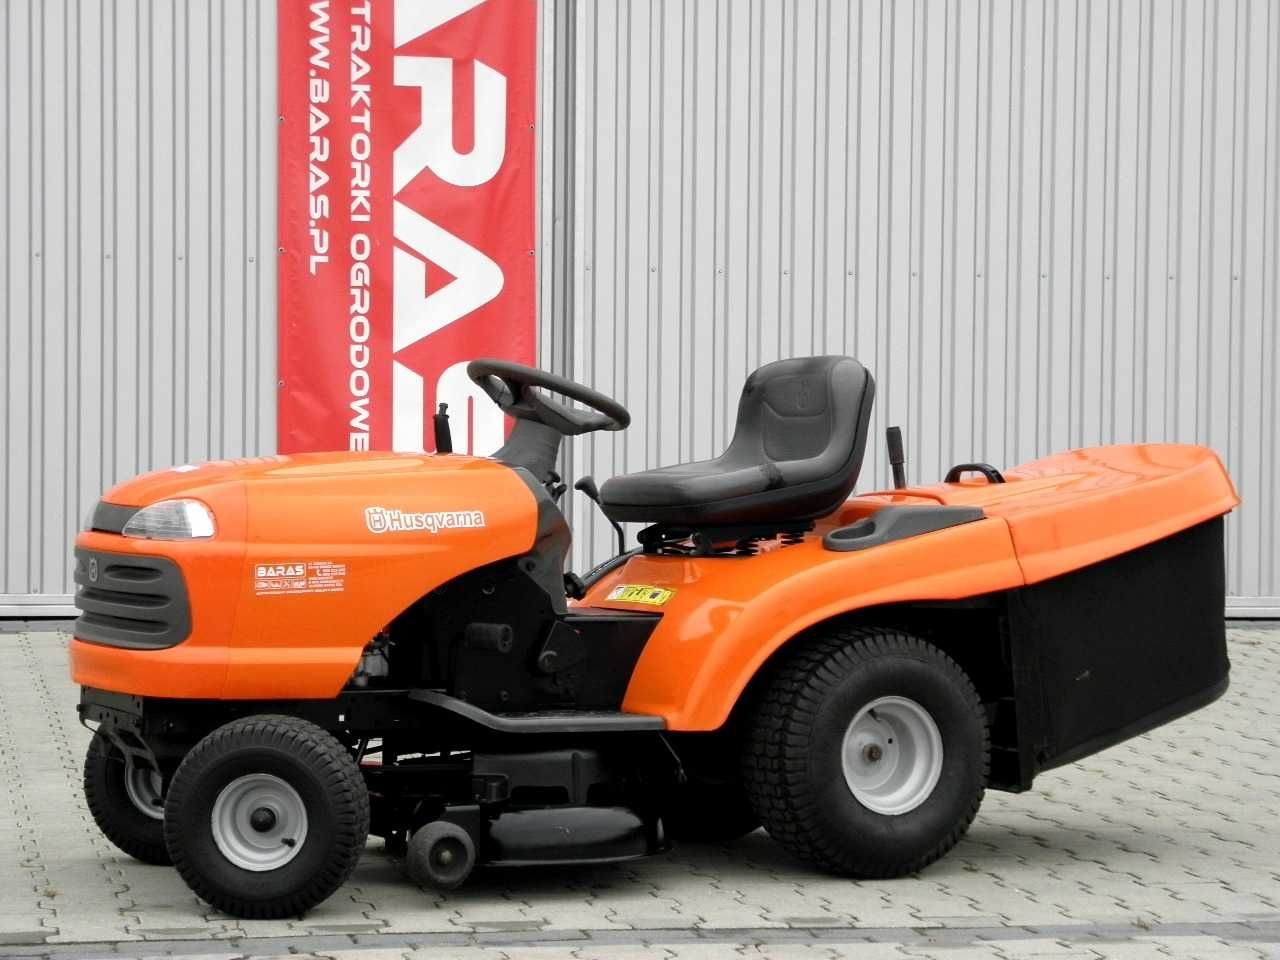 Traktorek kosiarka Husqvarna CTH135 (071001) - Baras